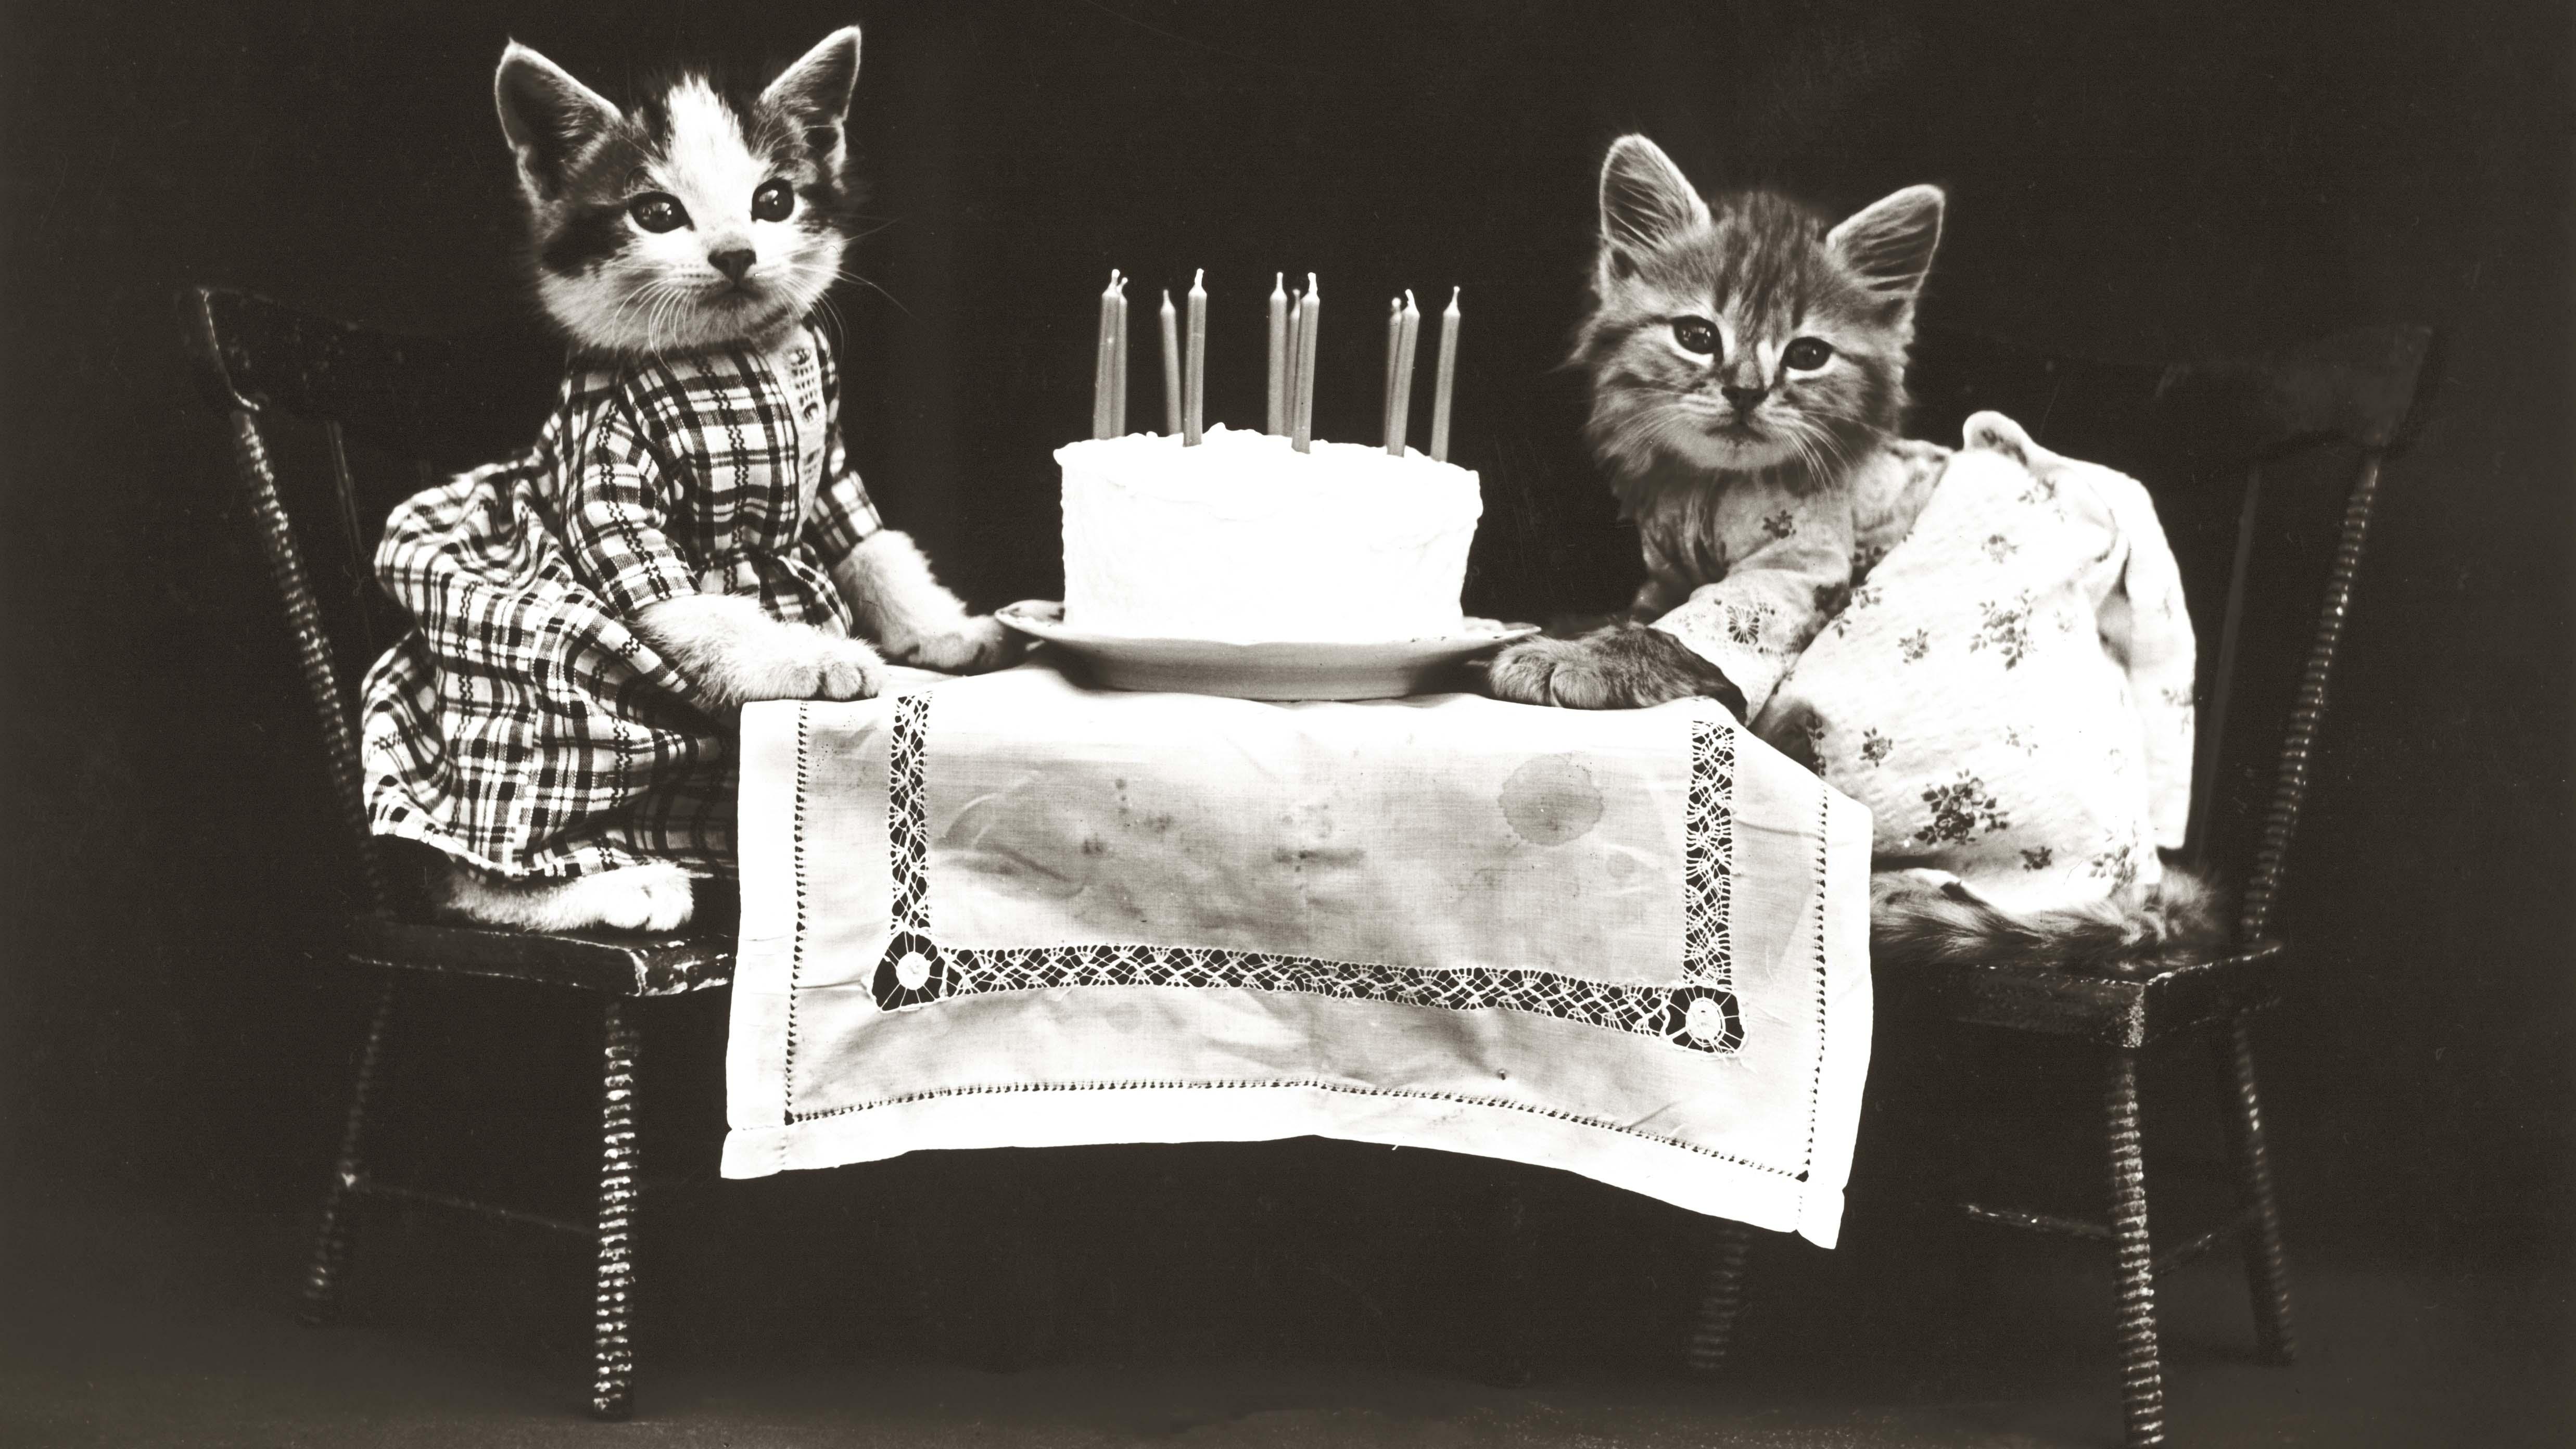 cats: an internet classic